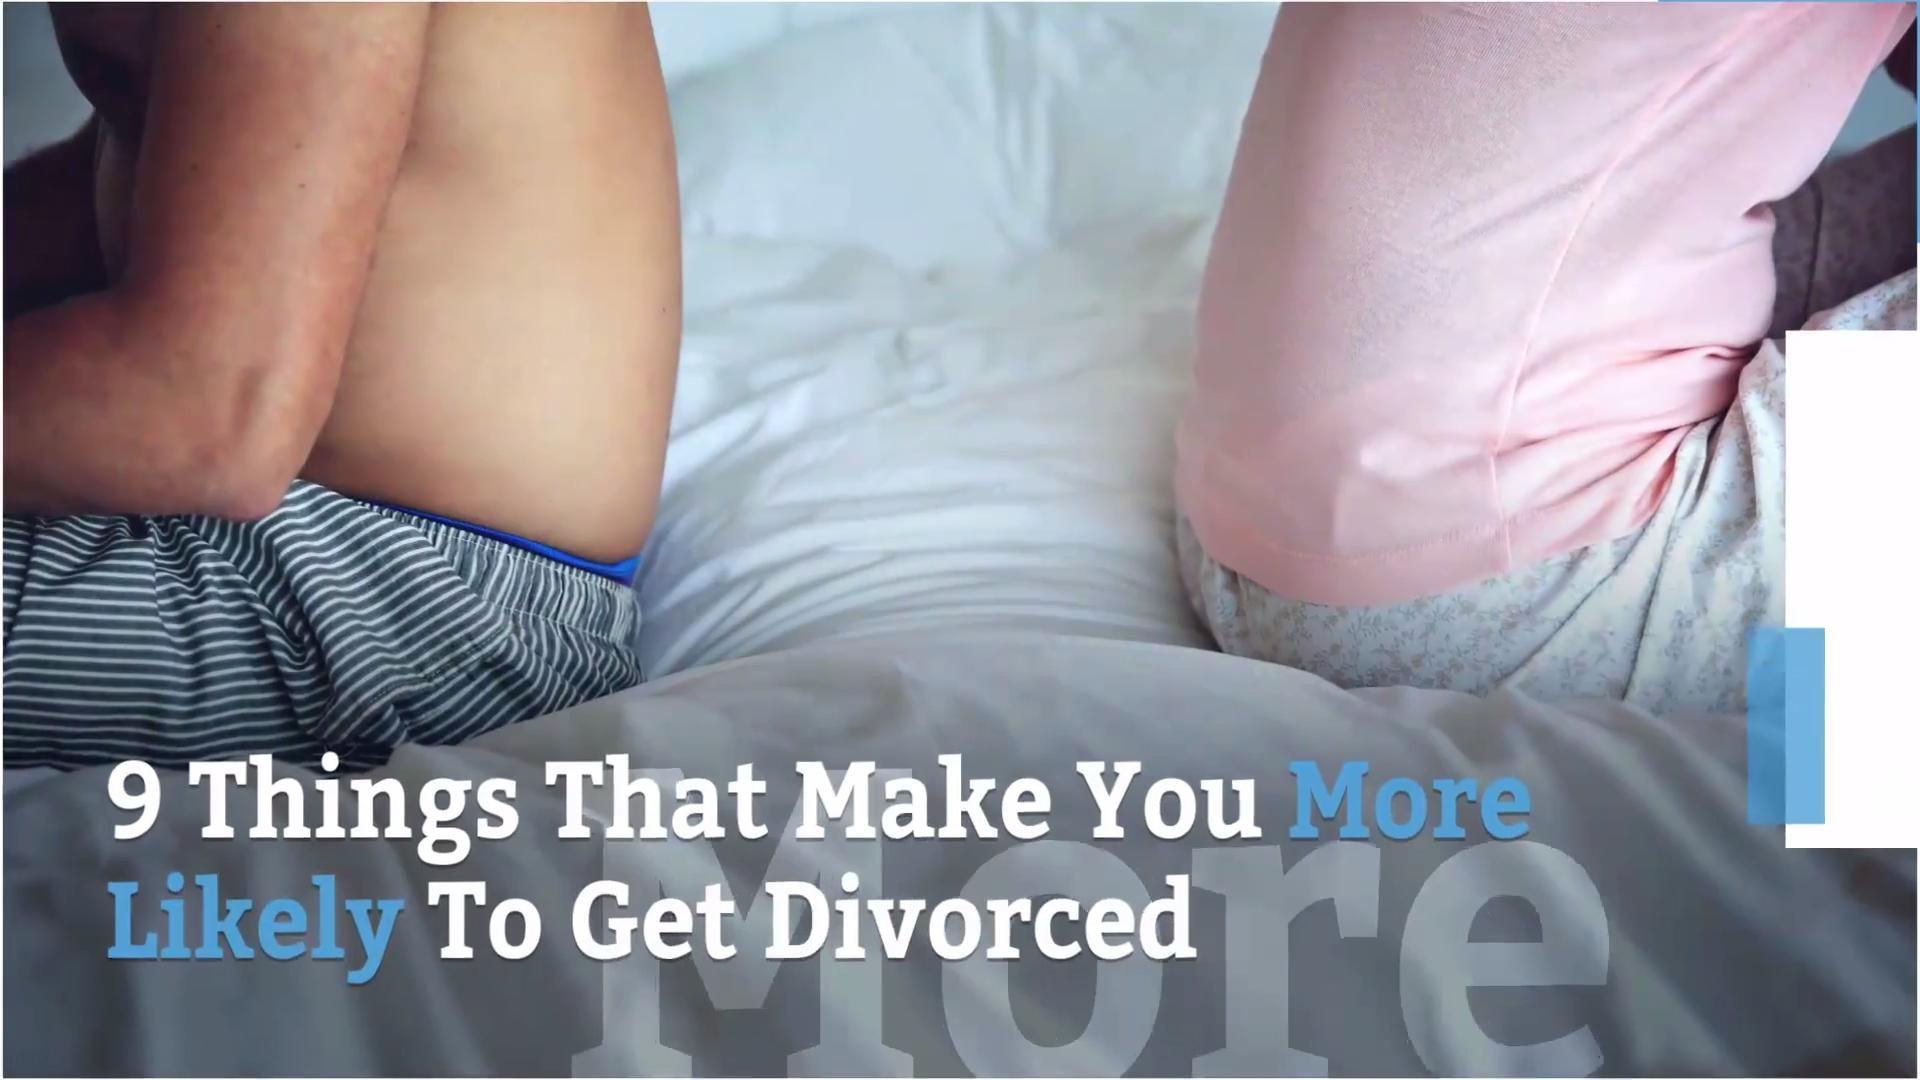 Divorce risk factors